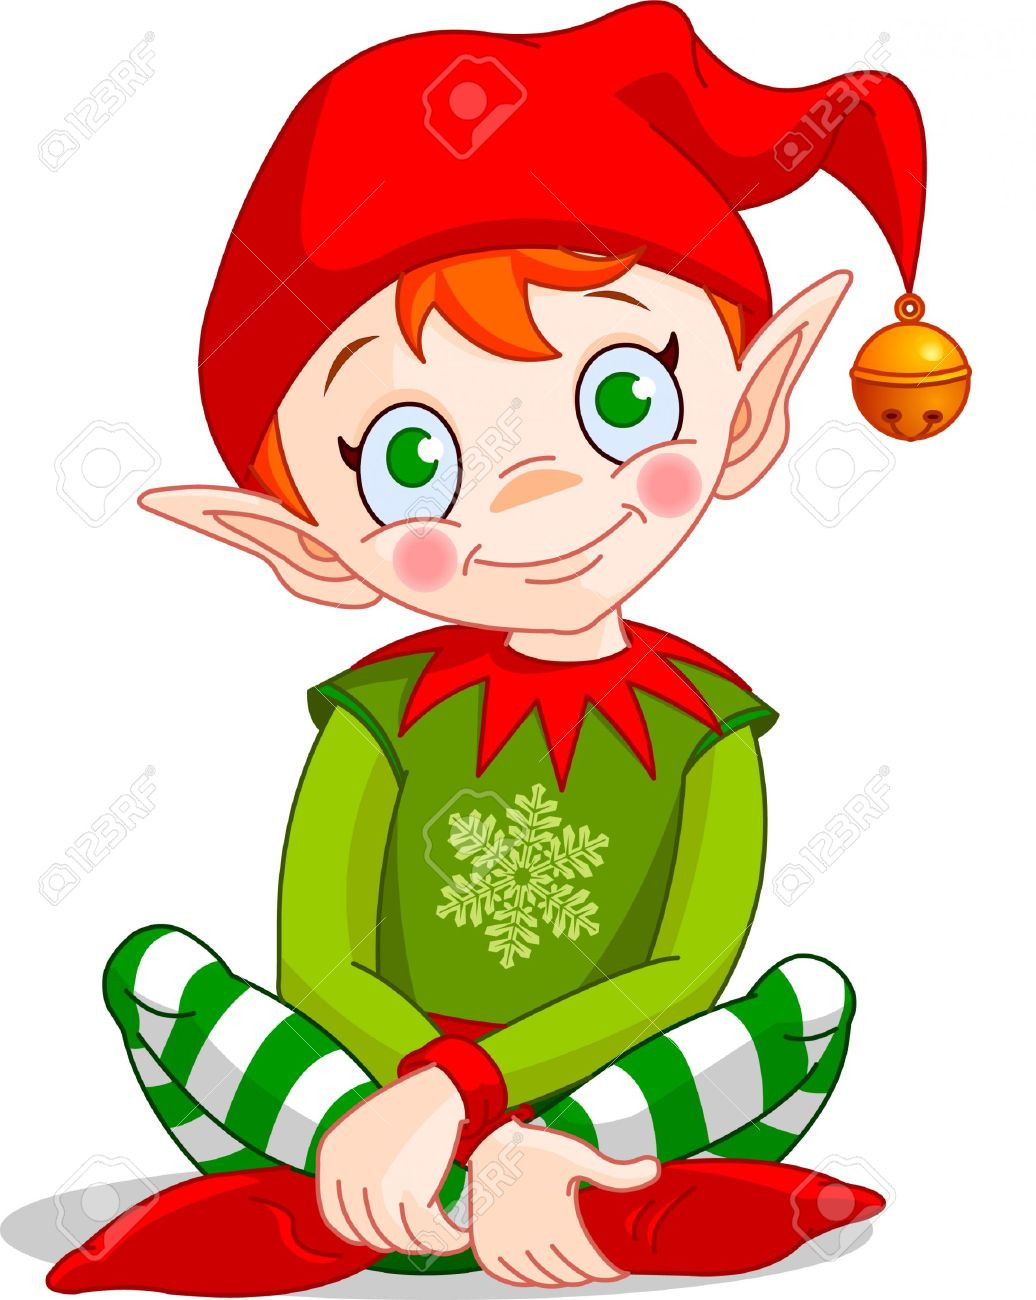 1036x1300 Elf Clip Art Thatswhatsup